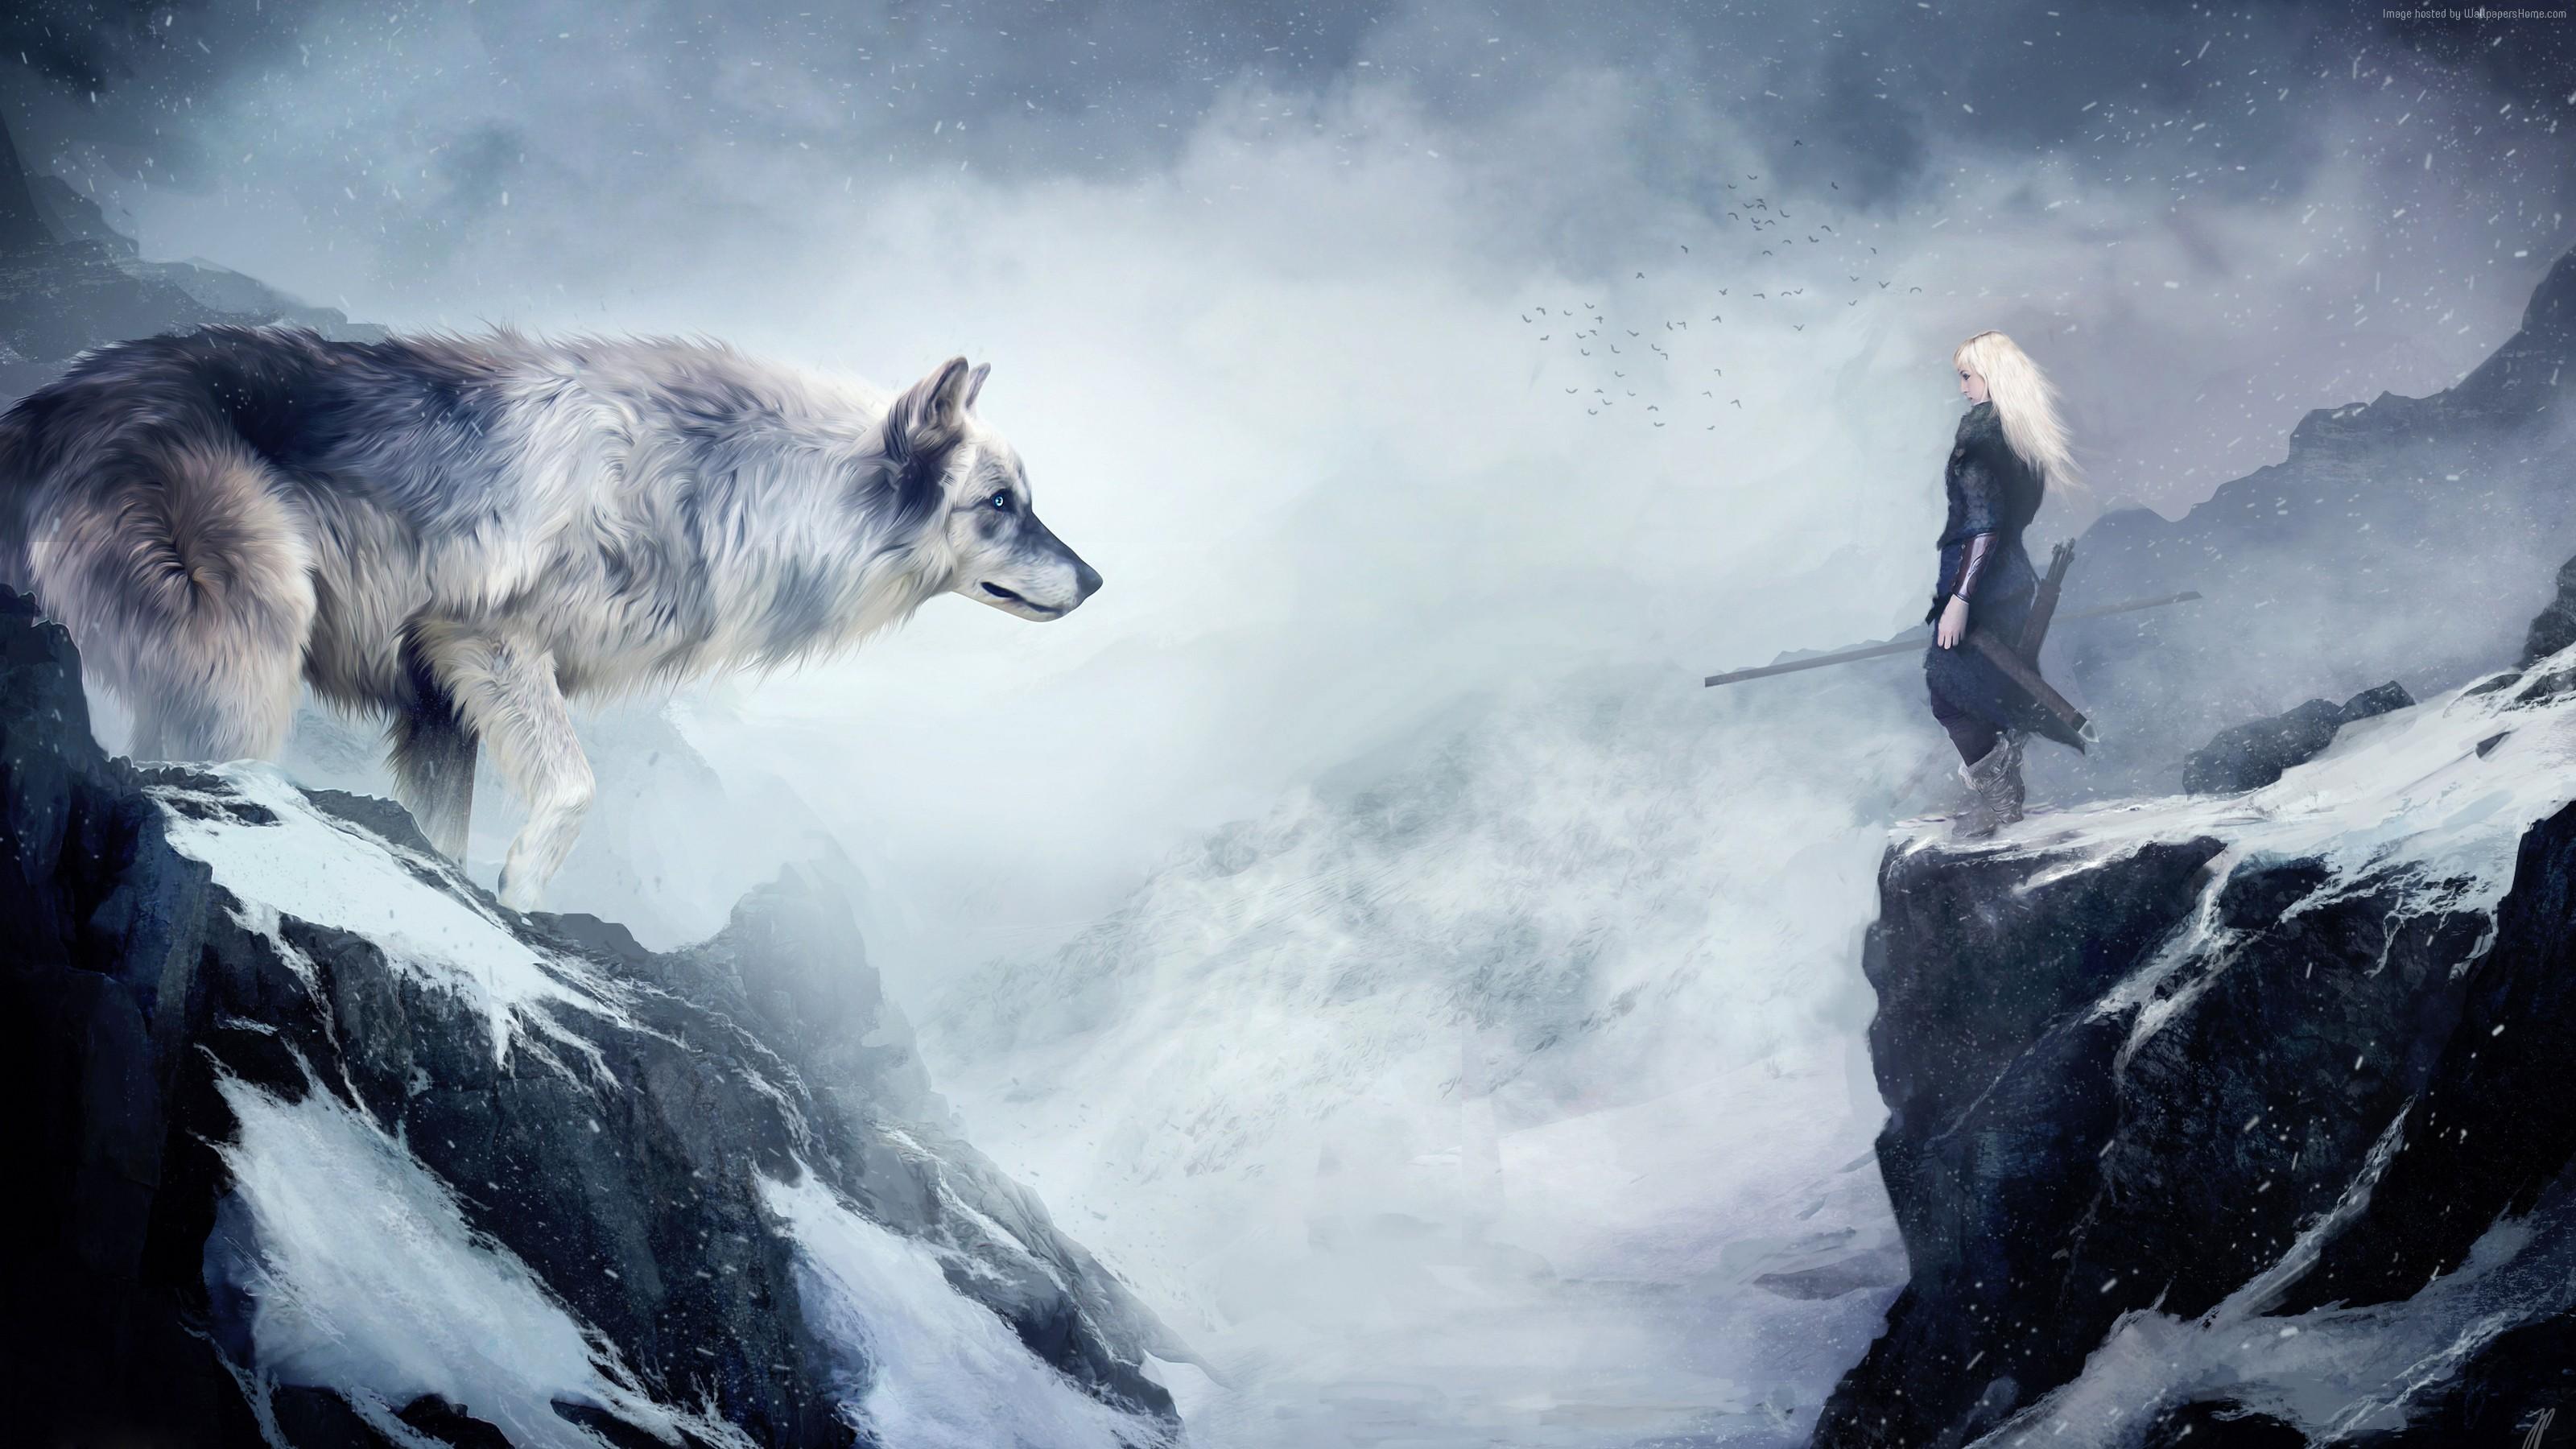 wolf Wallpaper OS wolf mountain girl animals winter drawing 3200x1800